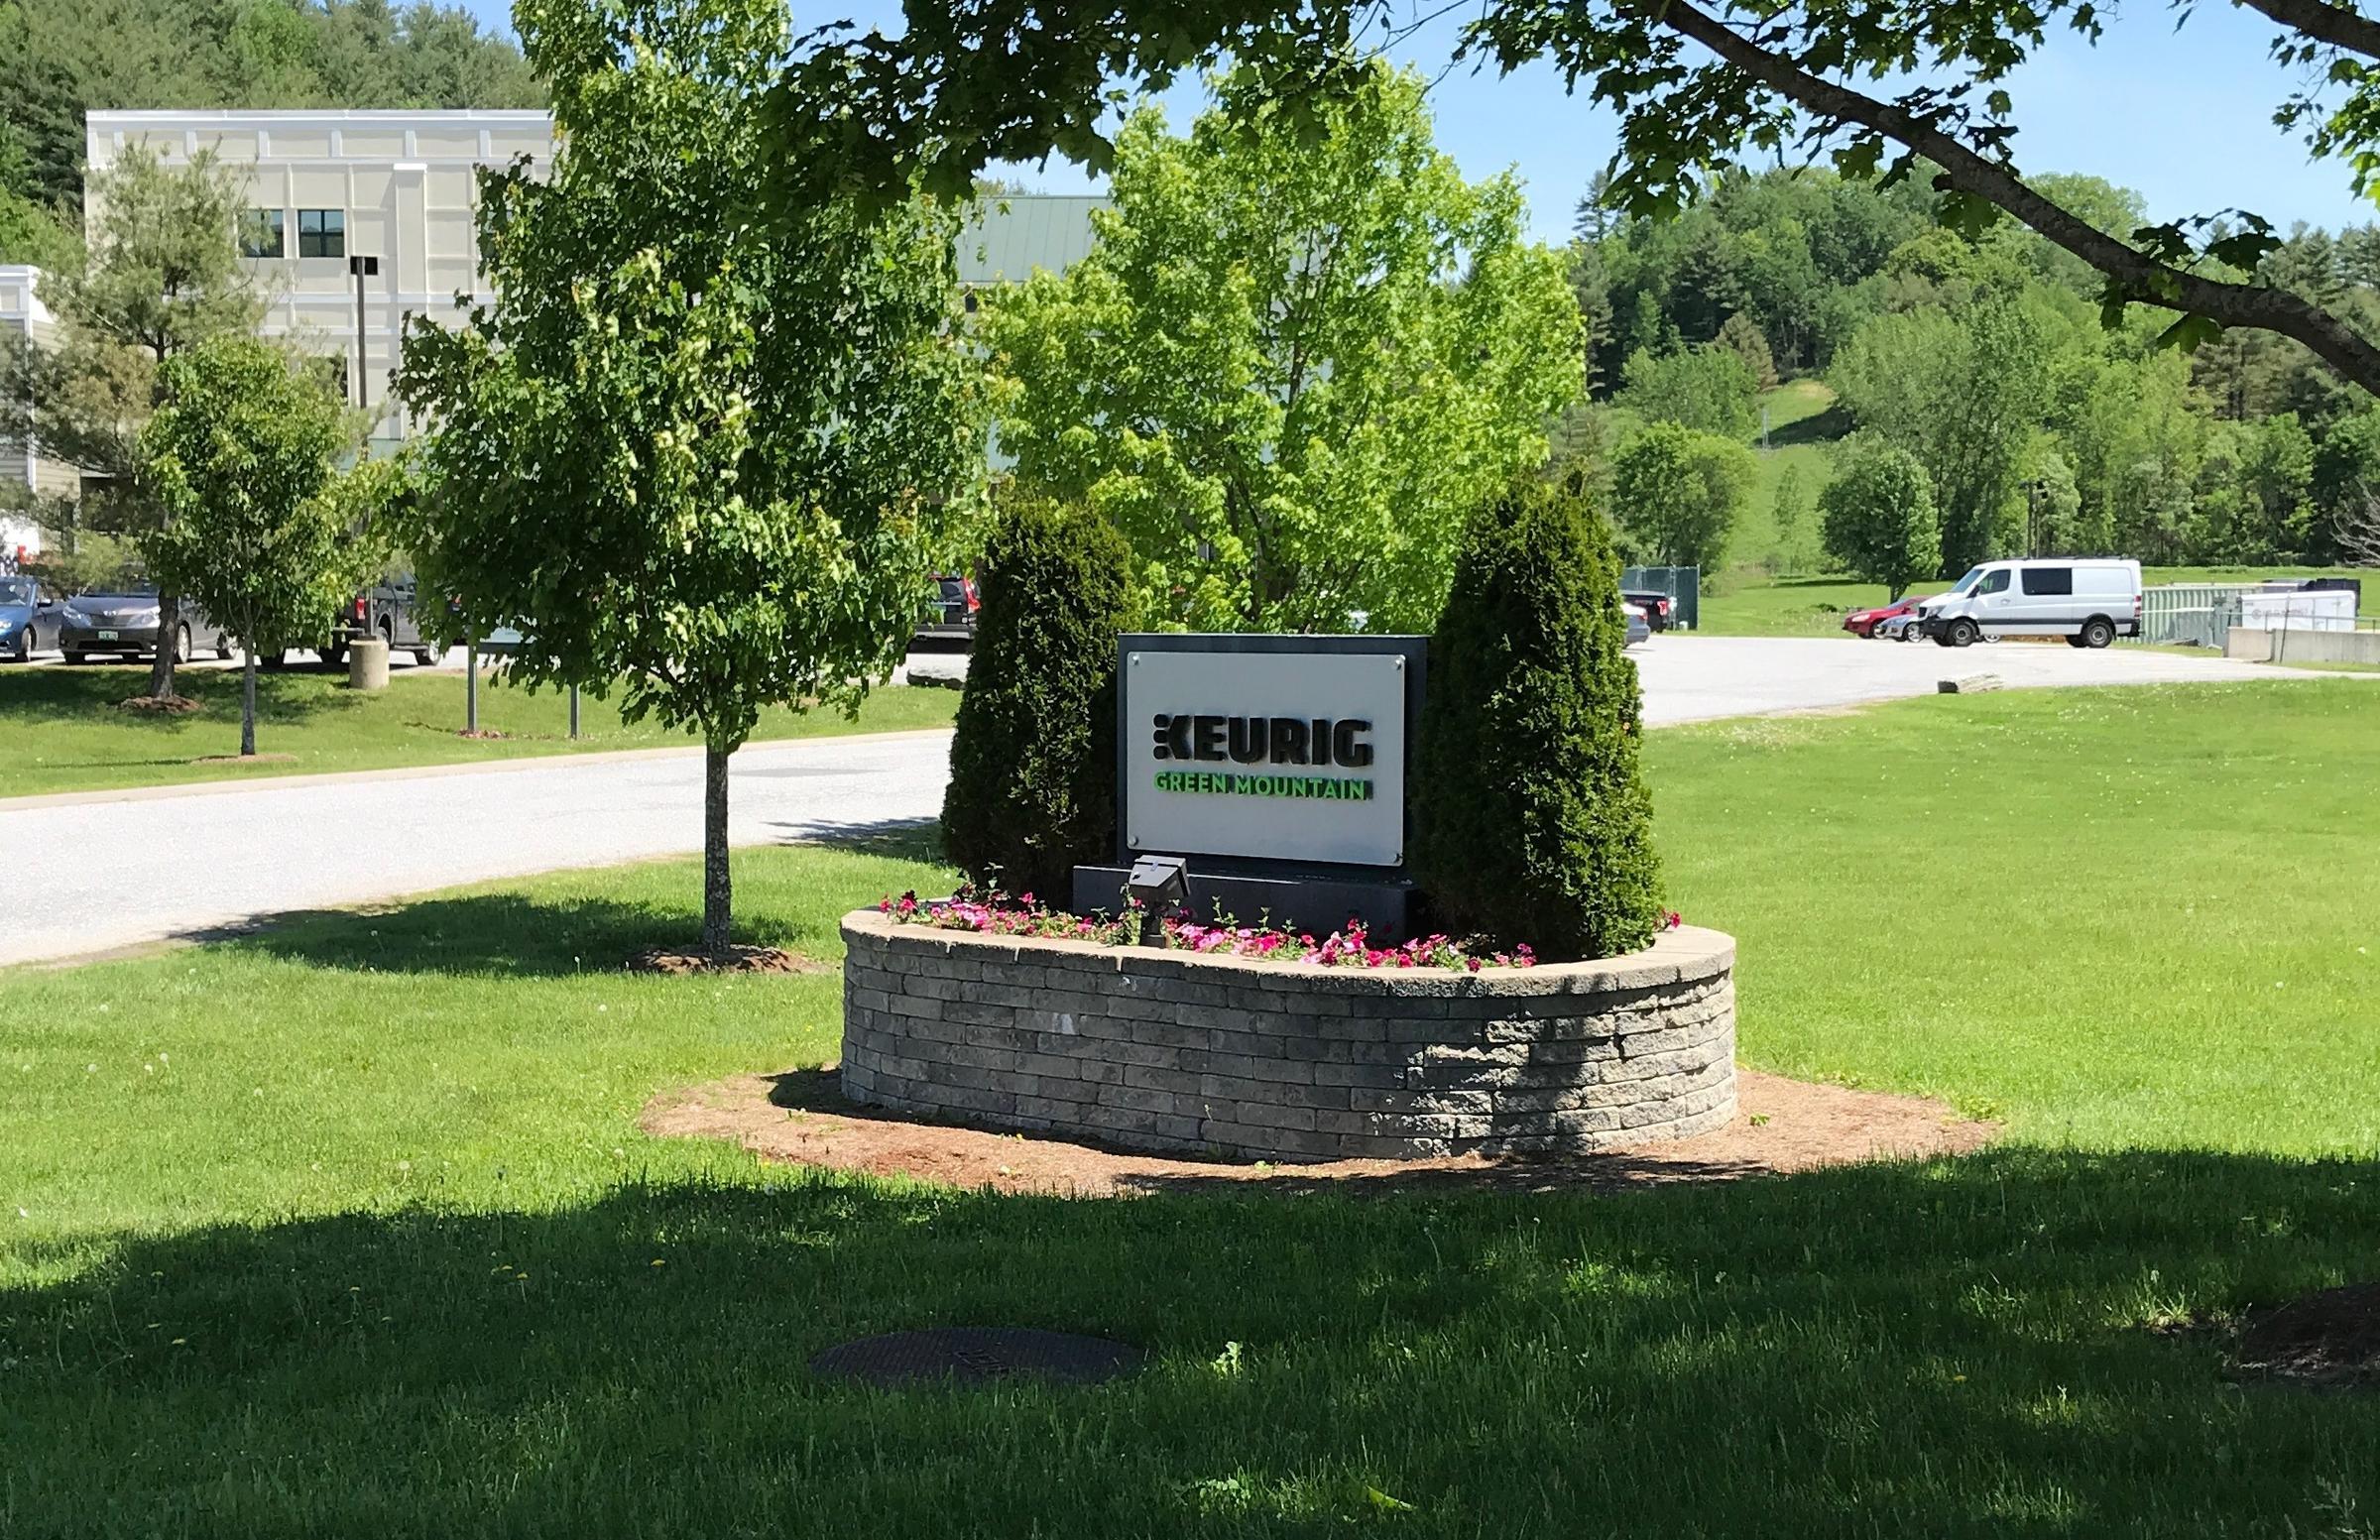 keurig green mountain lays off 35 vermont workers vermont public radio